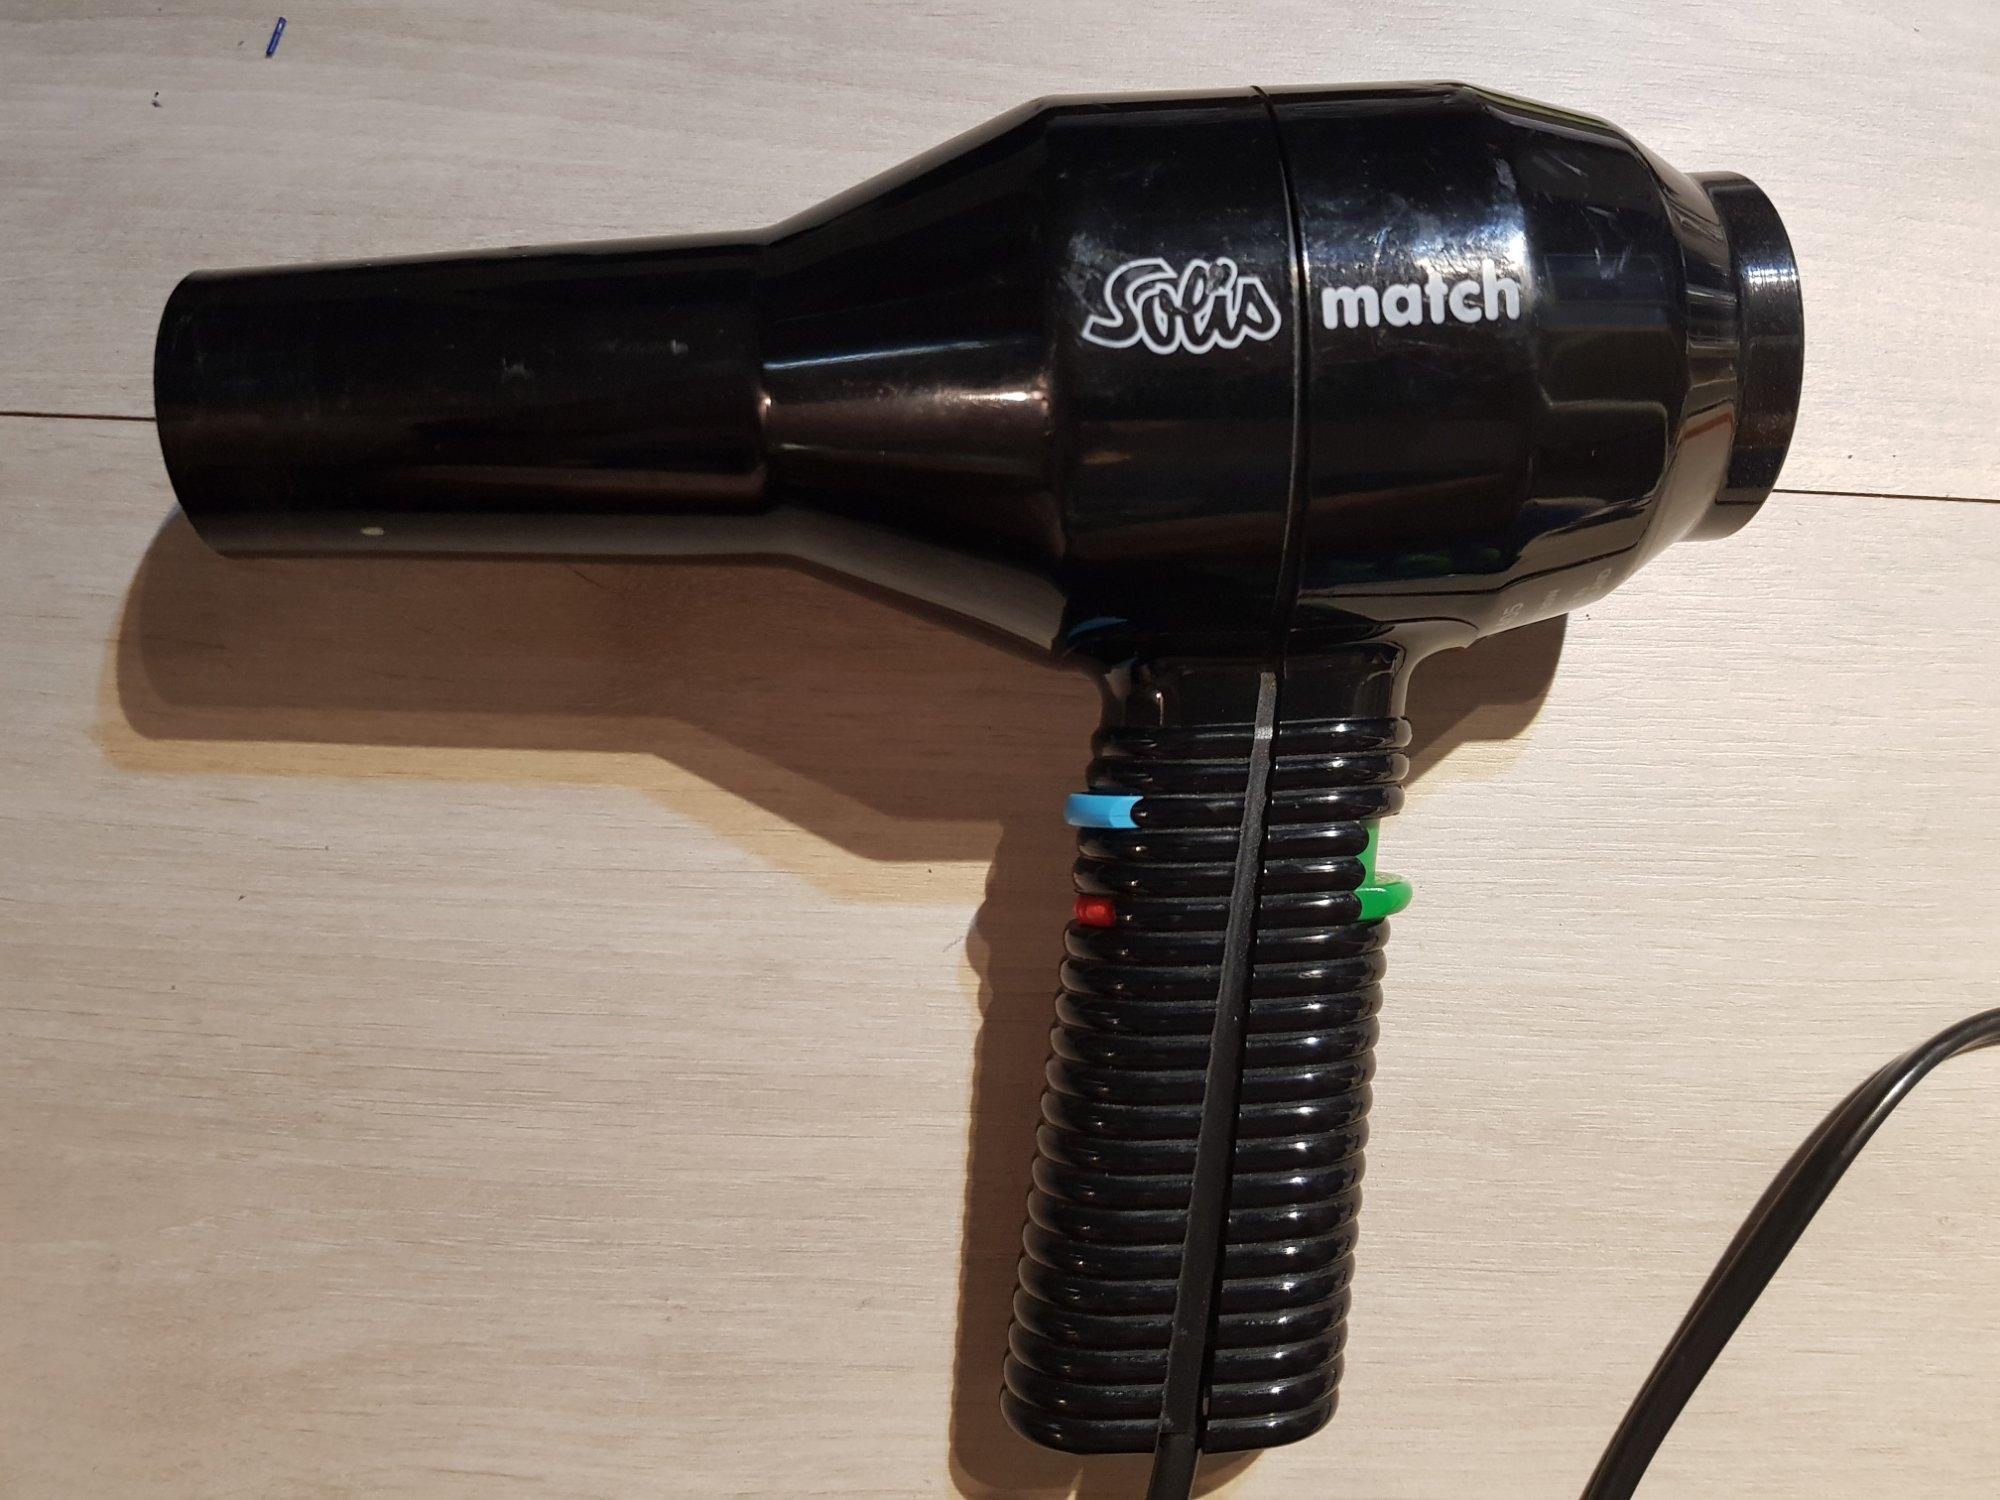 SOLIS Hairdryer